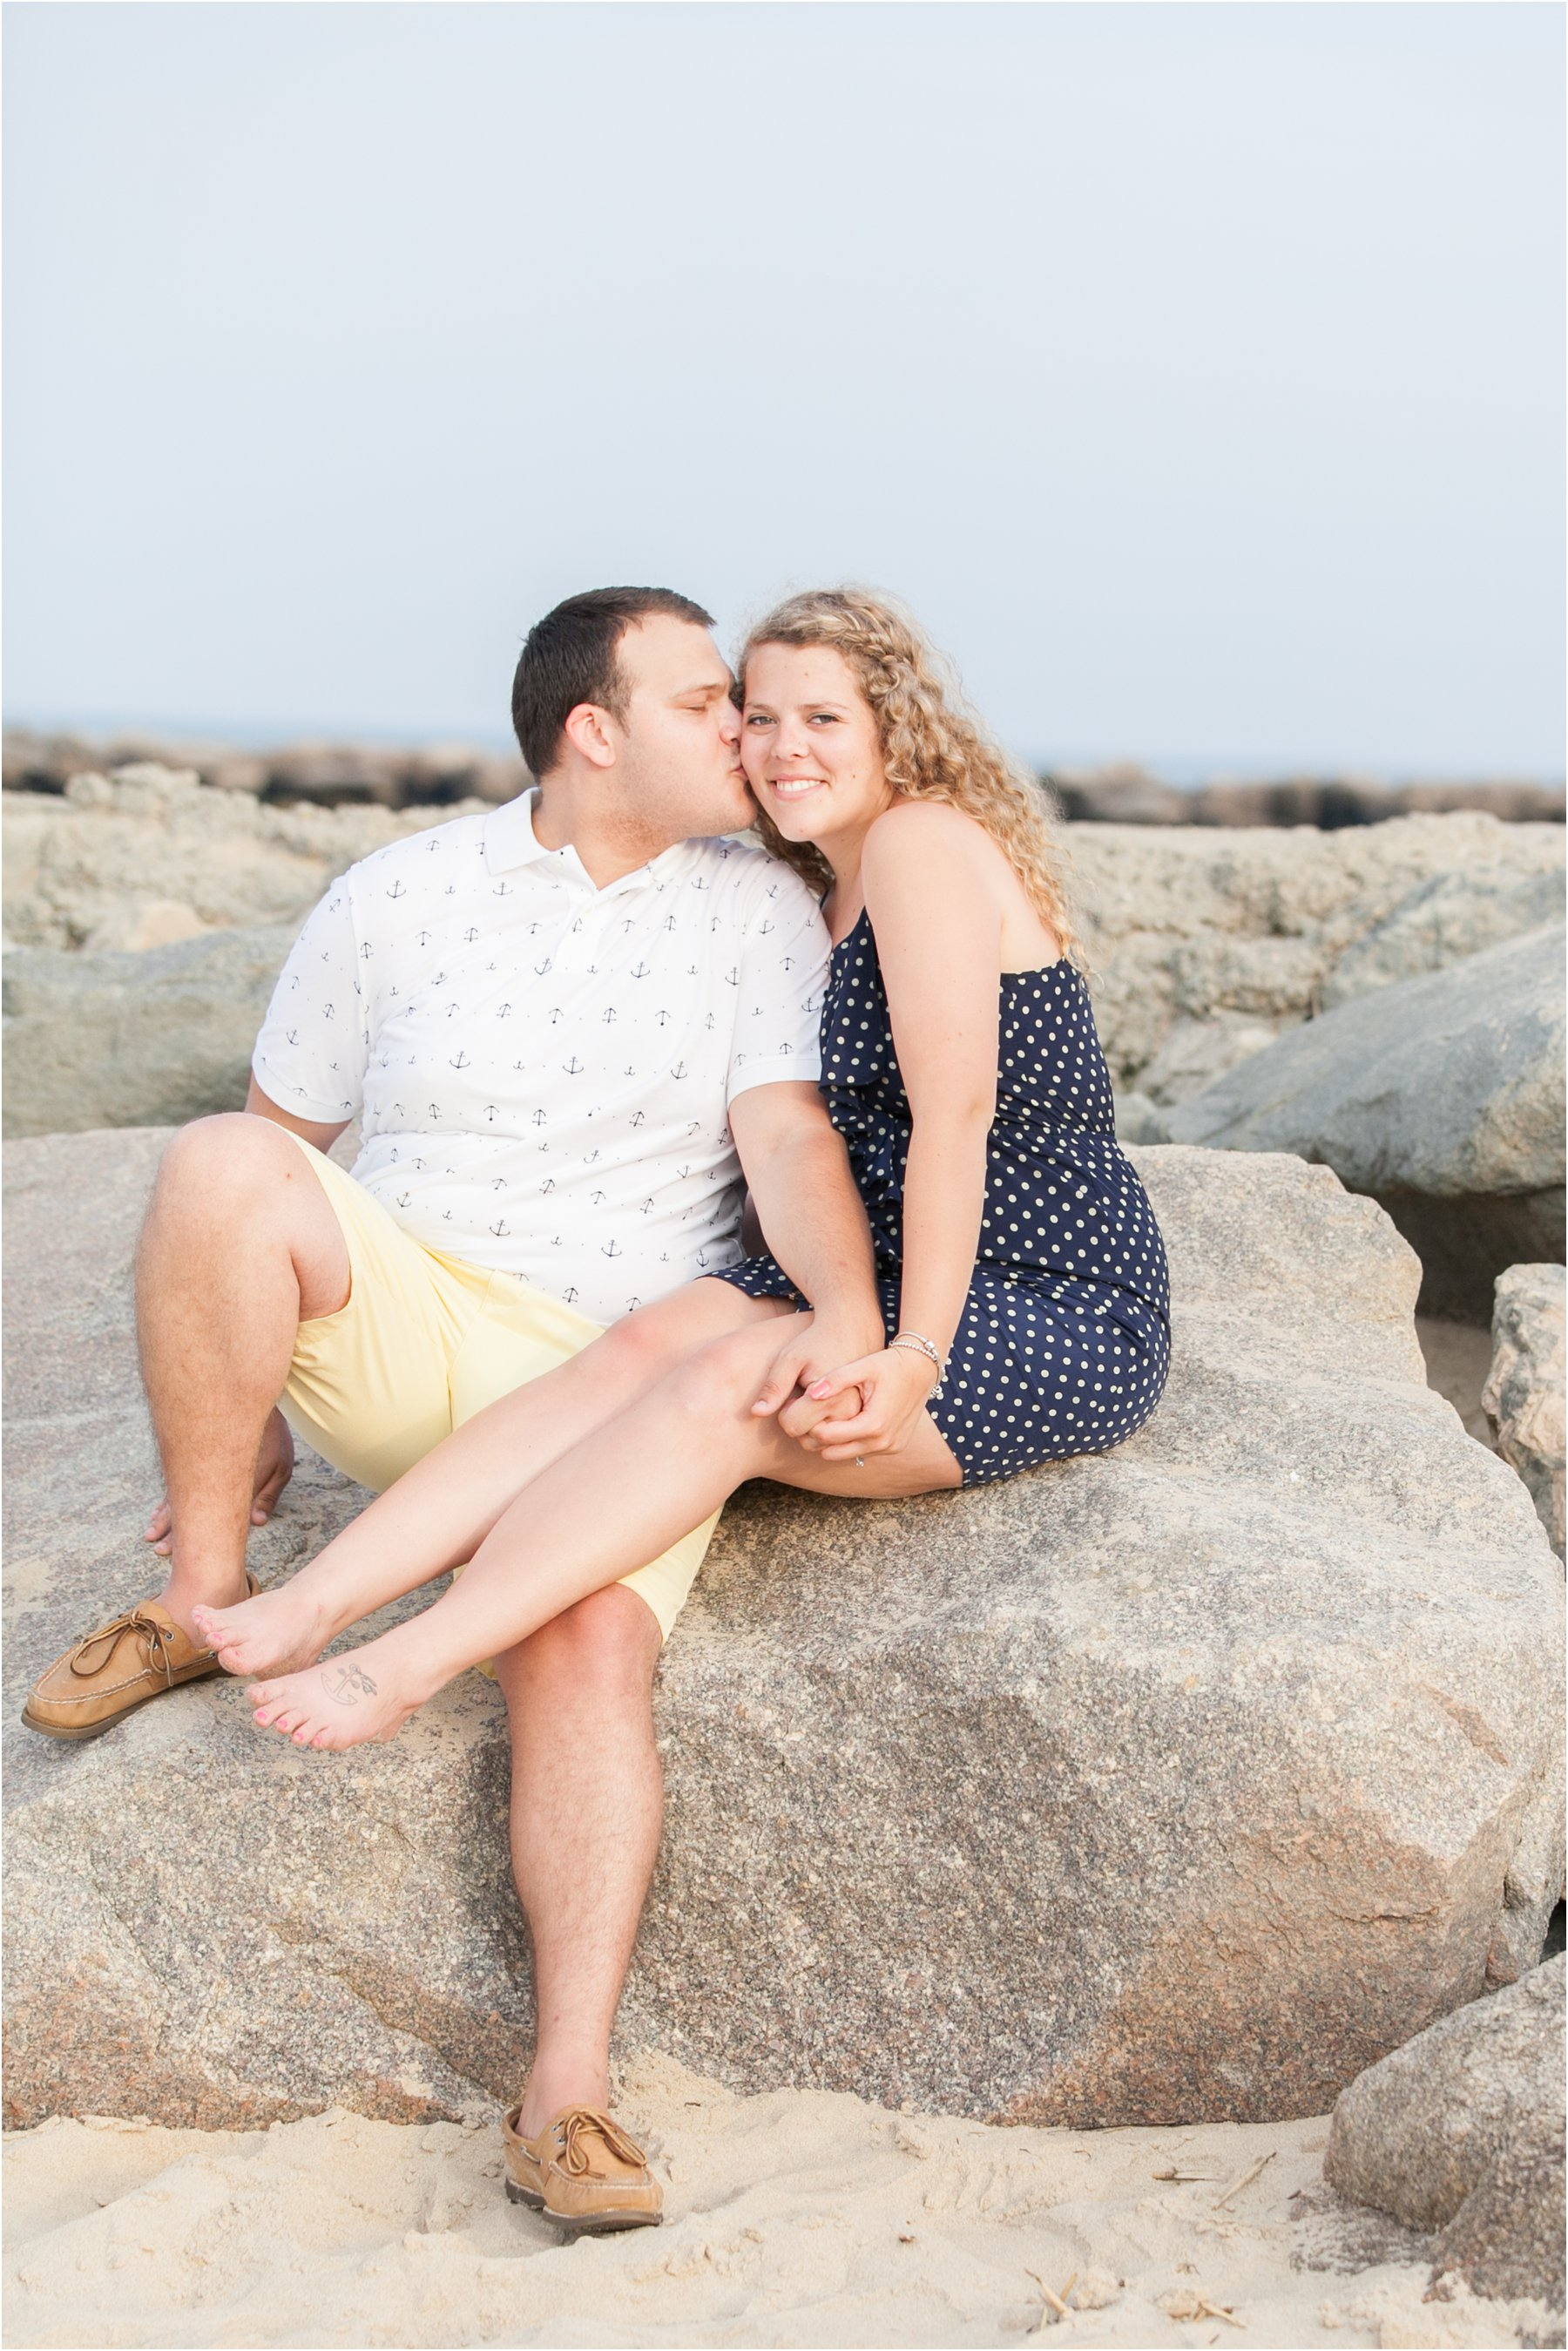 engagement_beach_Photography_Jessica_Ryan_Photography_virginia_virginia_beach_0304